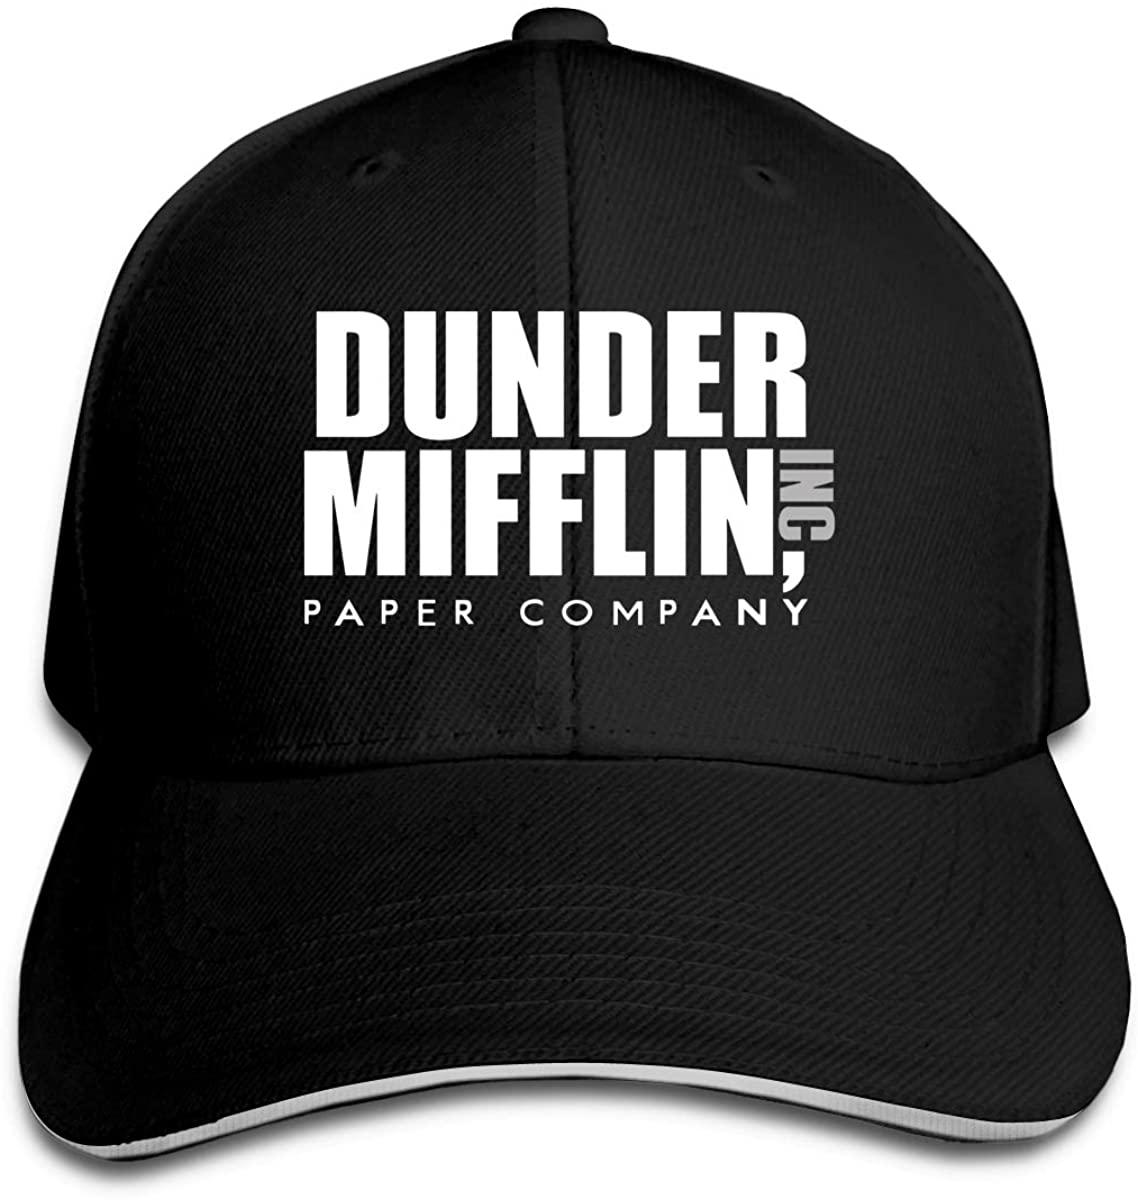 Dunder Mifflin Paper Lnc Women's and Boy Fashion Pointed Cap Cricket Cap